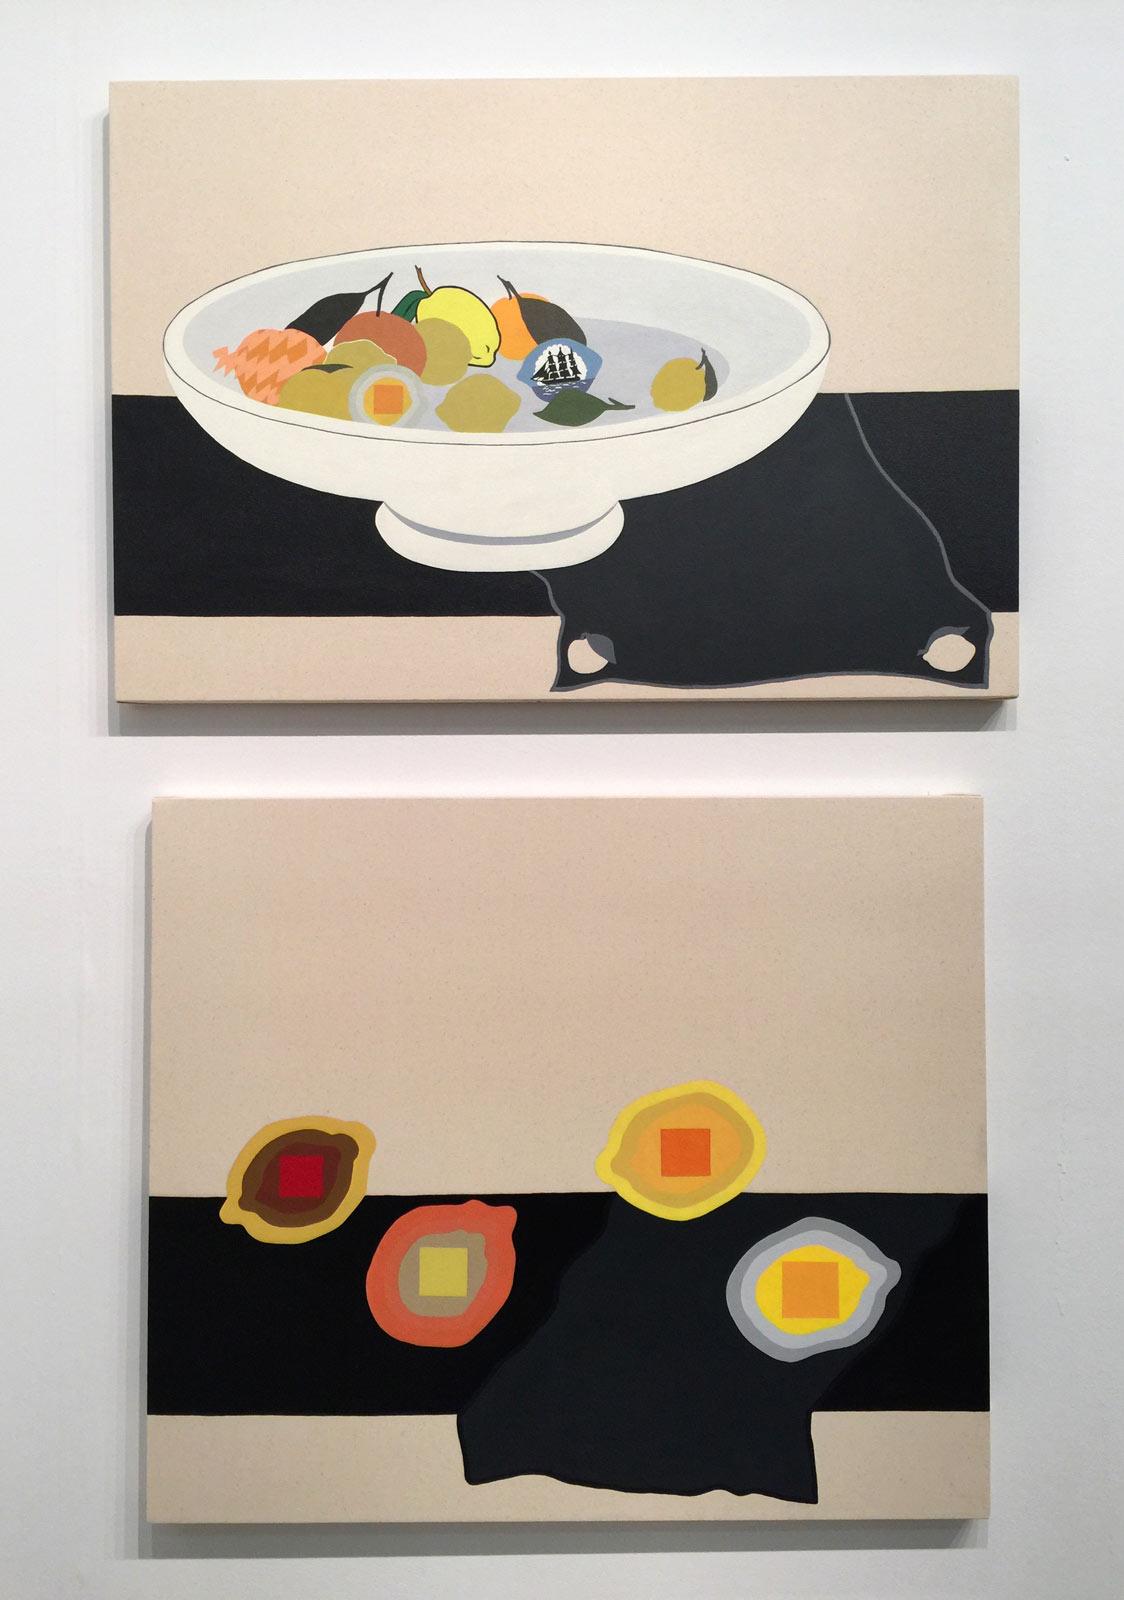 Stephen-D'Onofrio-Still-life-Lemon-Bowl-Josef-Albers-Lemons.jpg